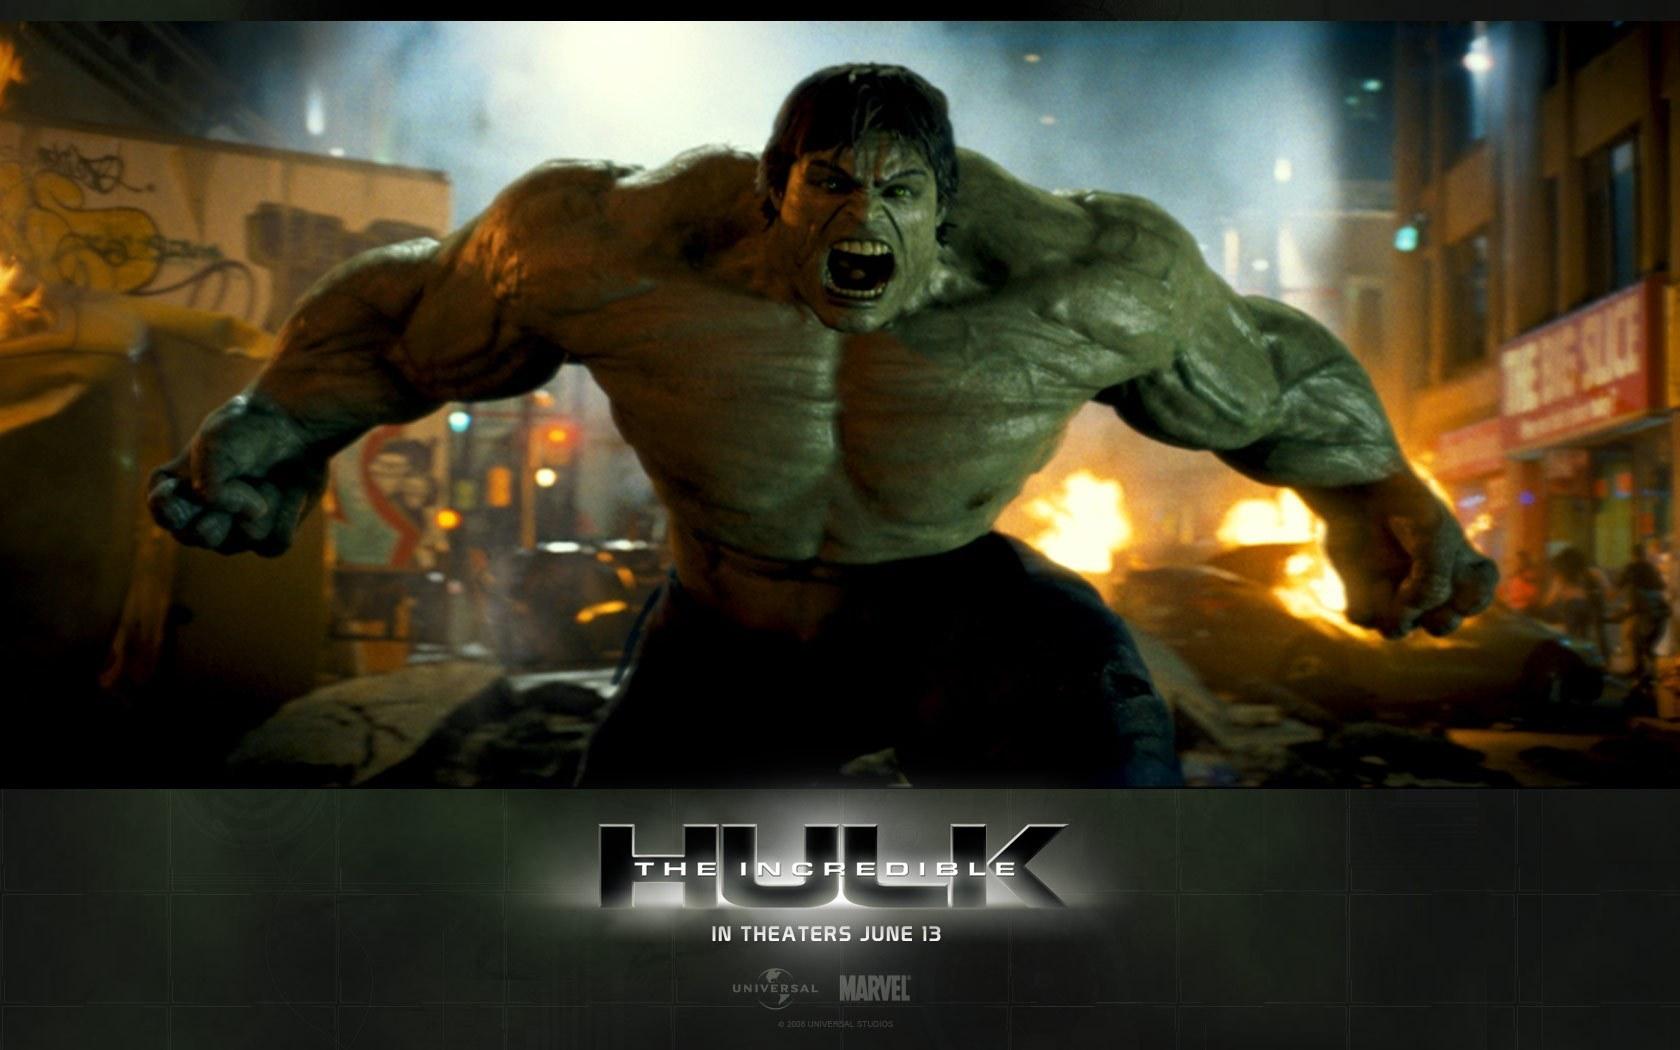 Hulk marvel comics 4515258 1680 1050